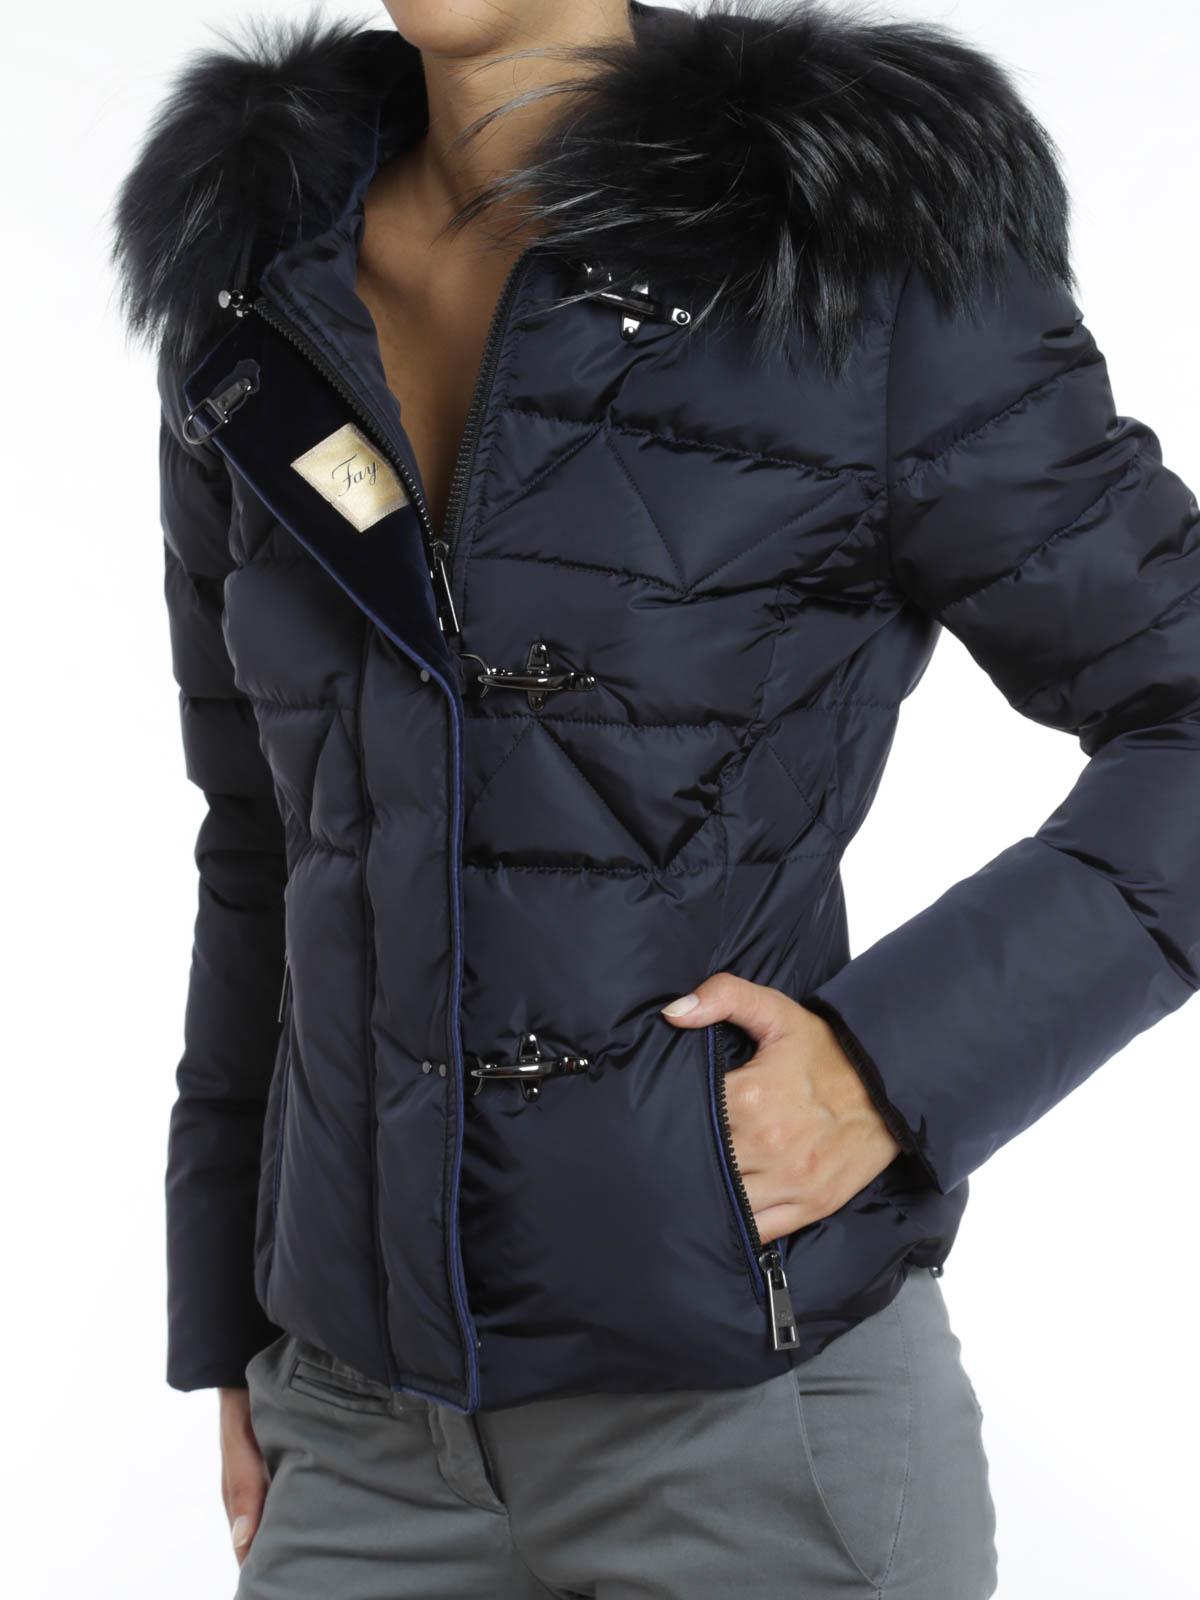 new concept 6b78f ec006 Fay - Piumino corto imbottito - giacche imbottite ...